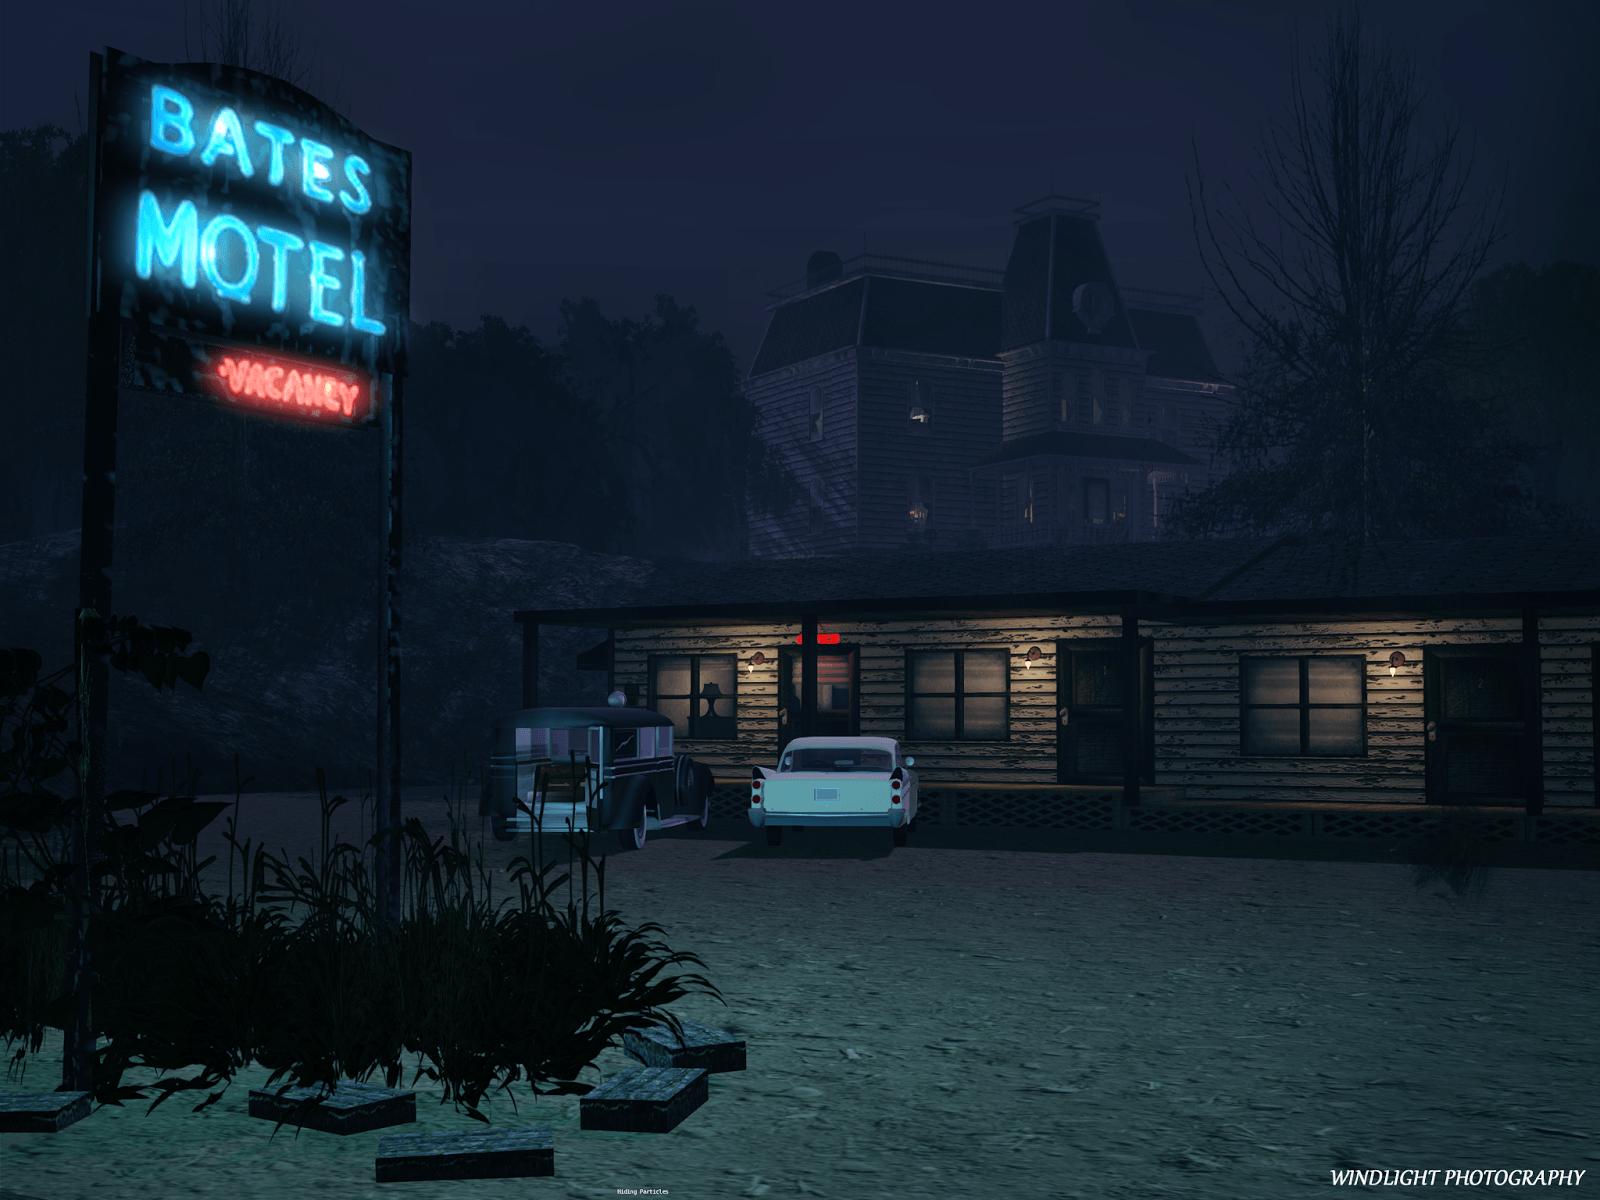 Jackson Redstar Photography: Bates Motel Apocalypse